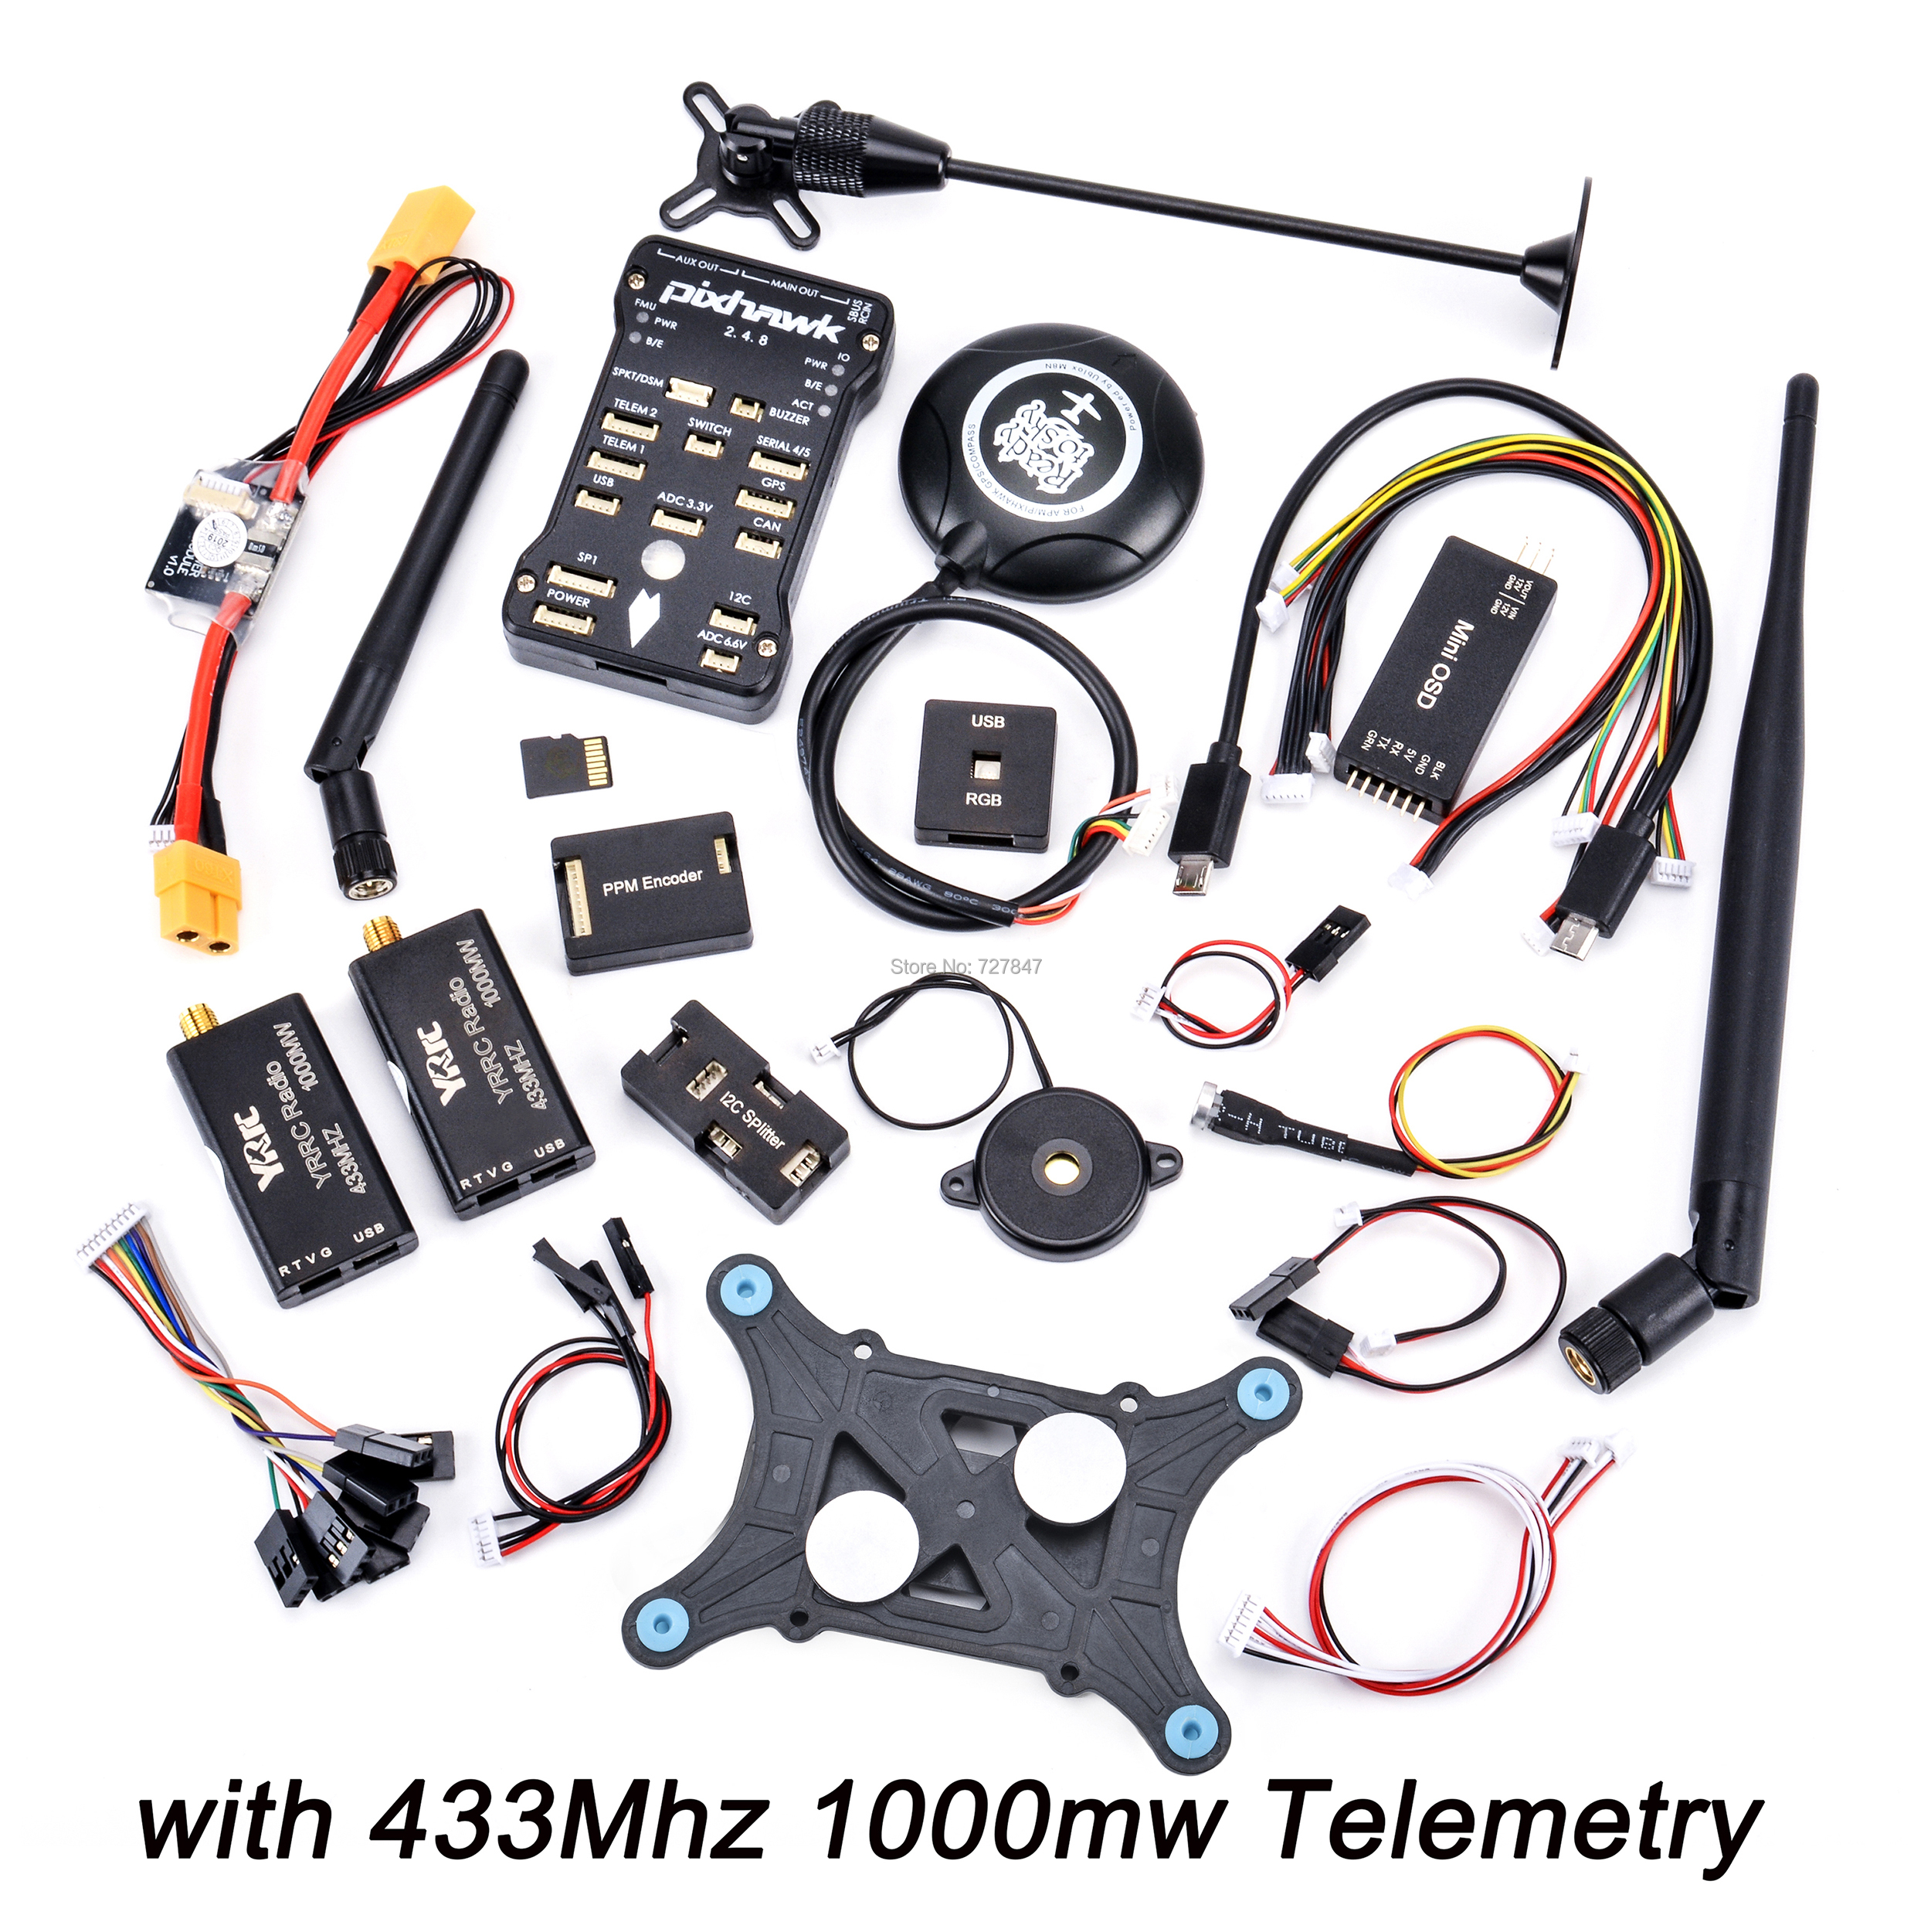 Pixhawk PX4 PIX 2.4.8 32 Bit Flight Controller + 433 / 915 Telemetry+M8N GPS+Minim OSD+PM+Safety Switch+Buzzer+PPM+I2C+ 4G SD